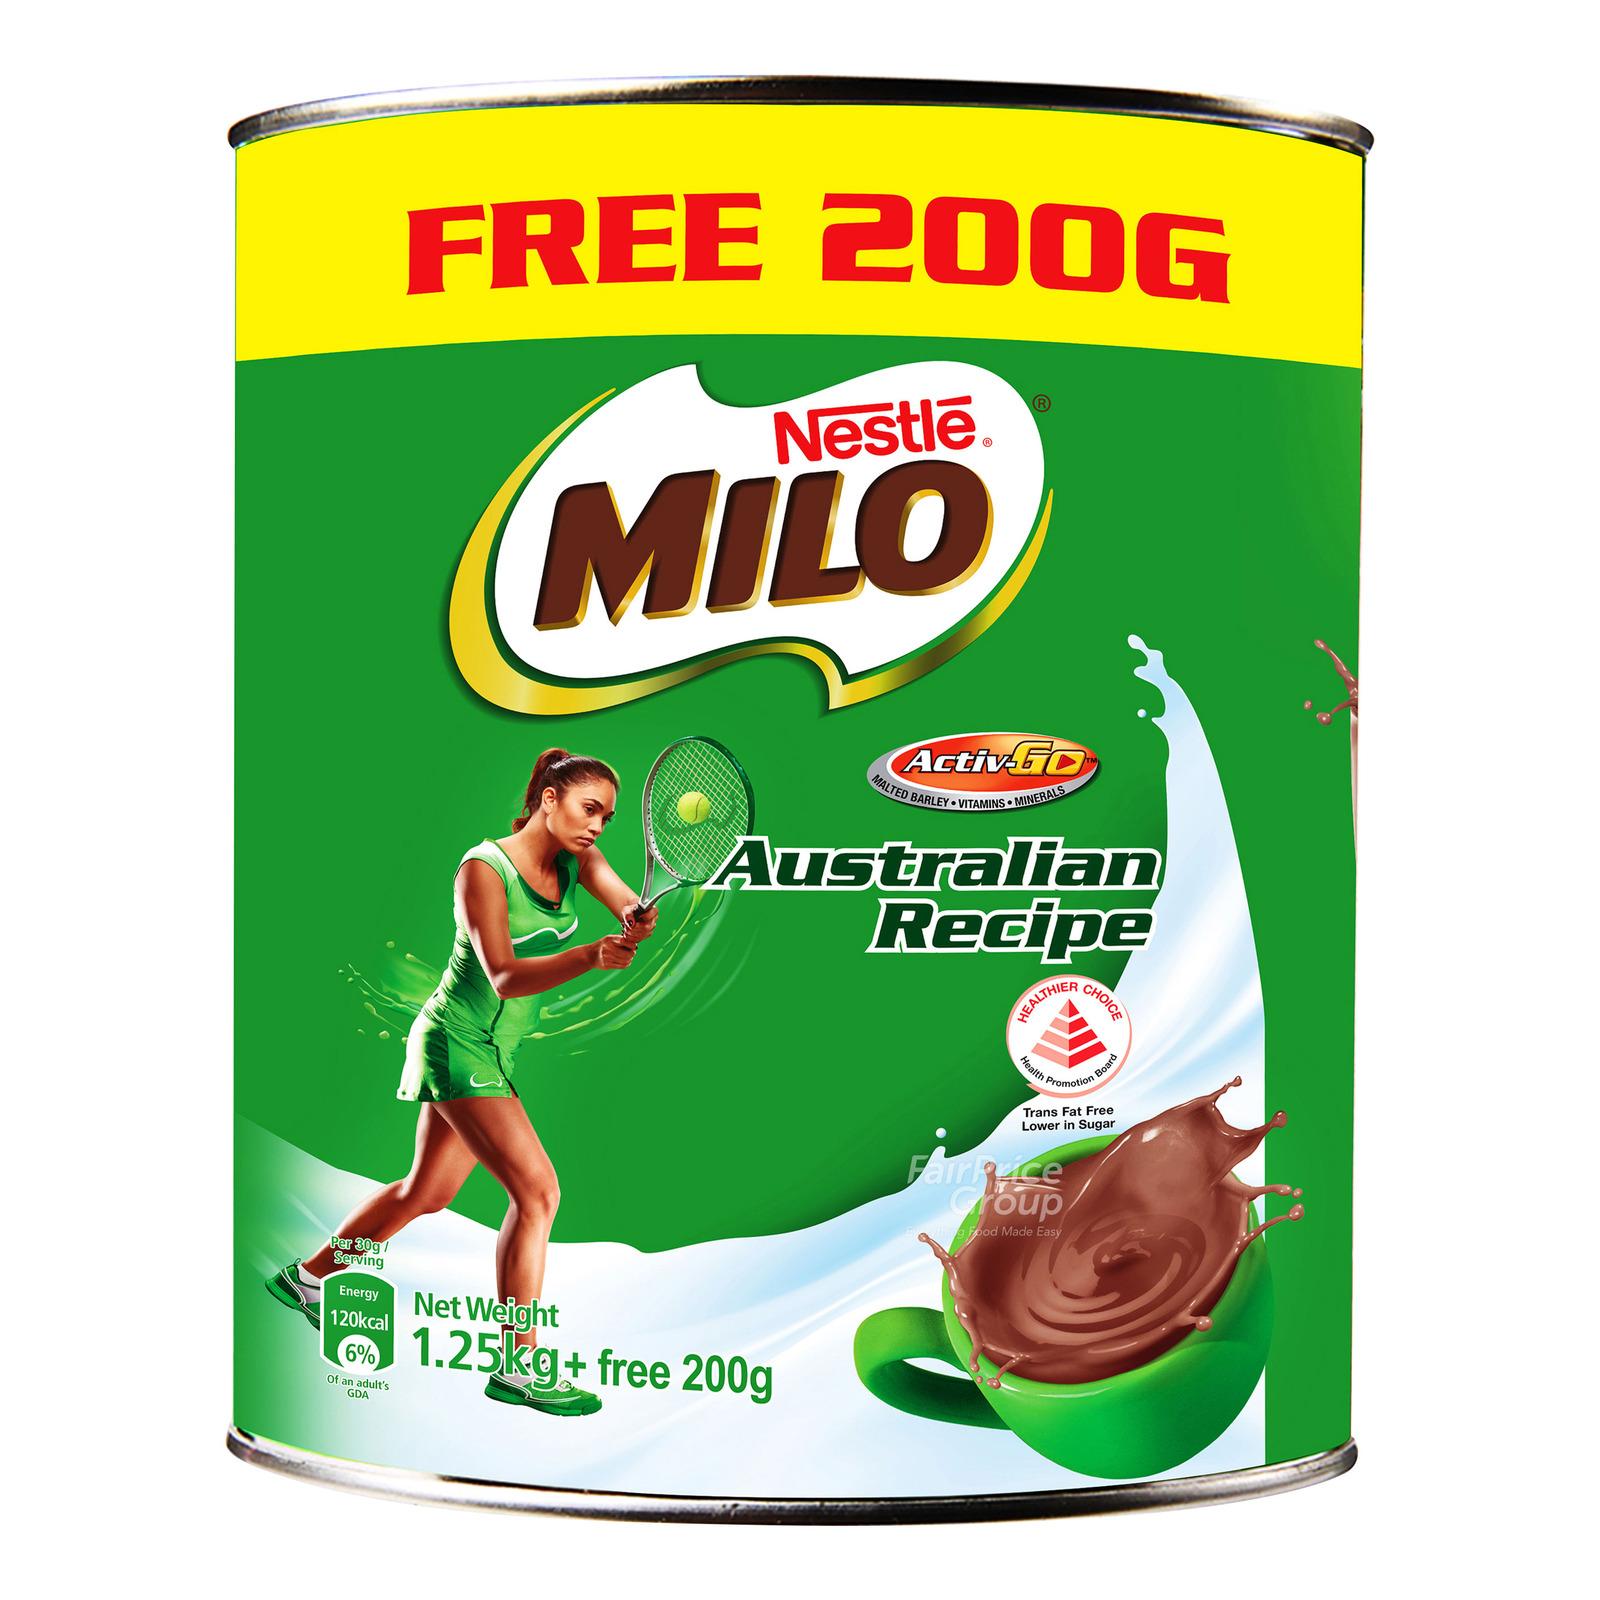 Milo Instant Chocolate Malt Drink Powder - Australian Recipe